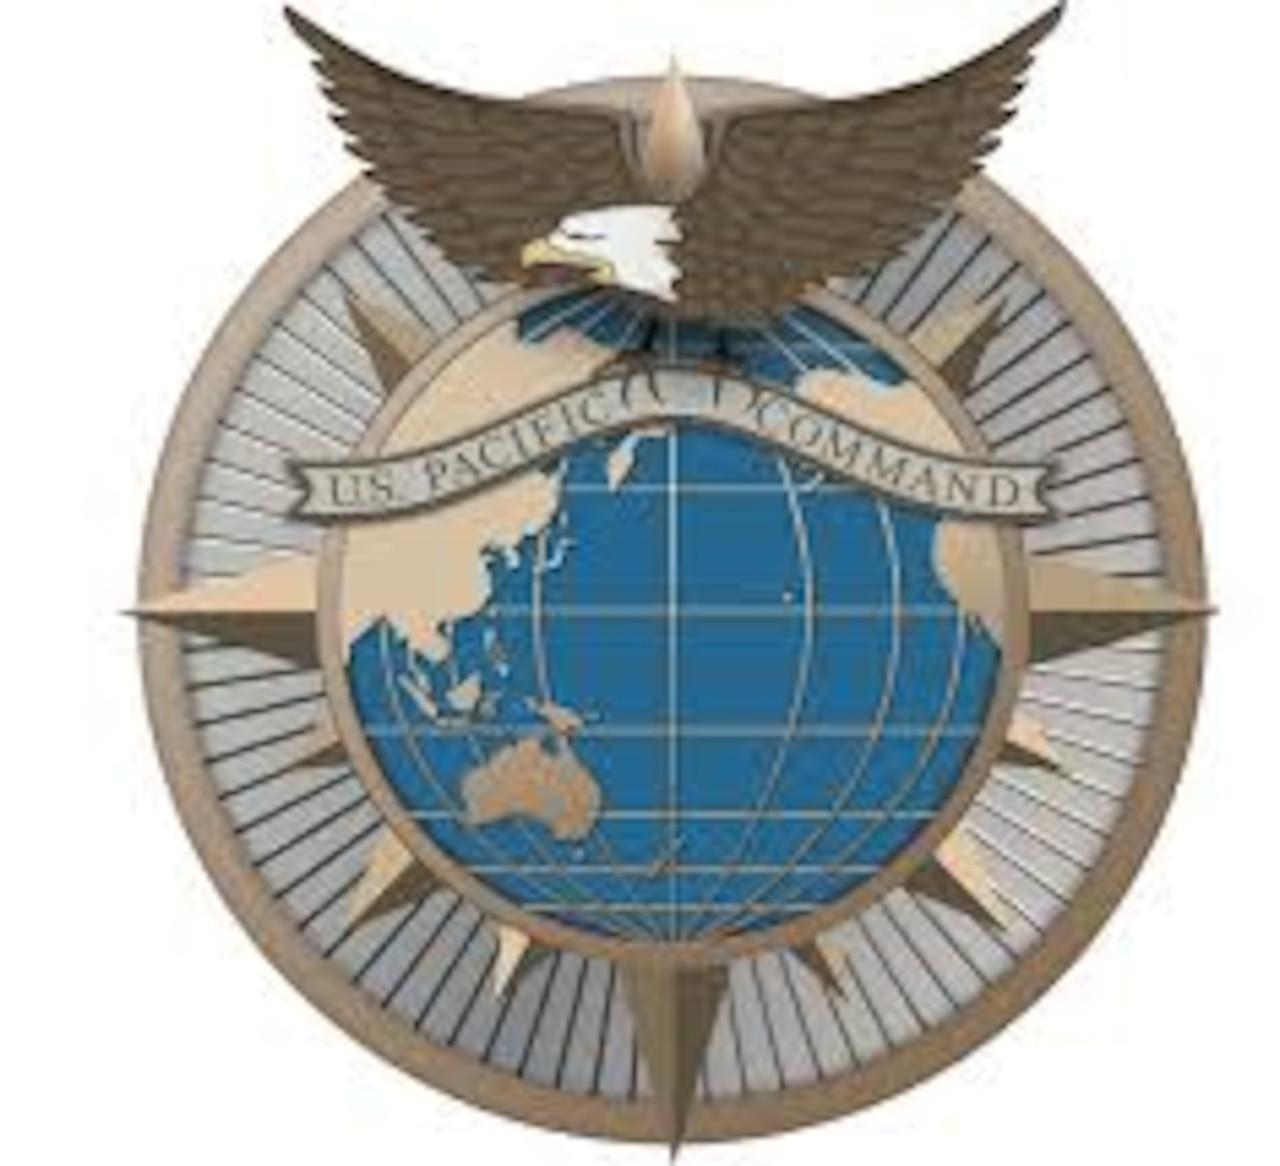 U.S. Pacific Command